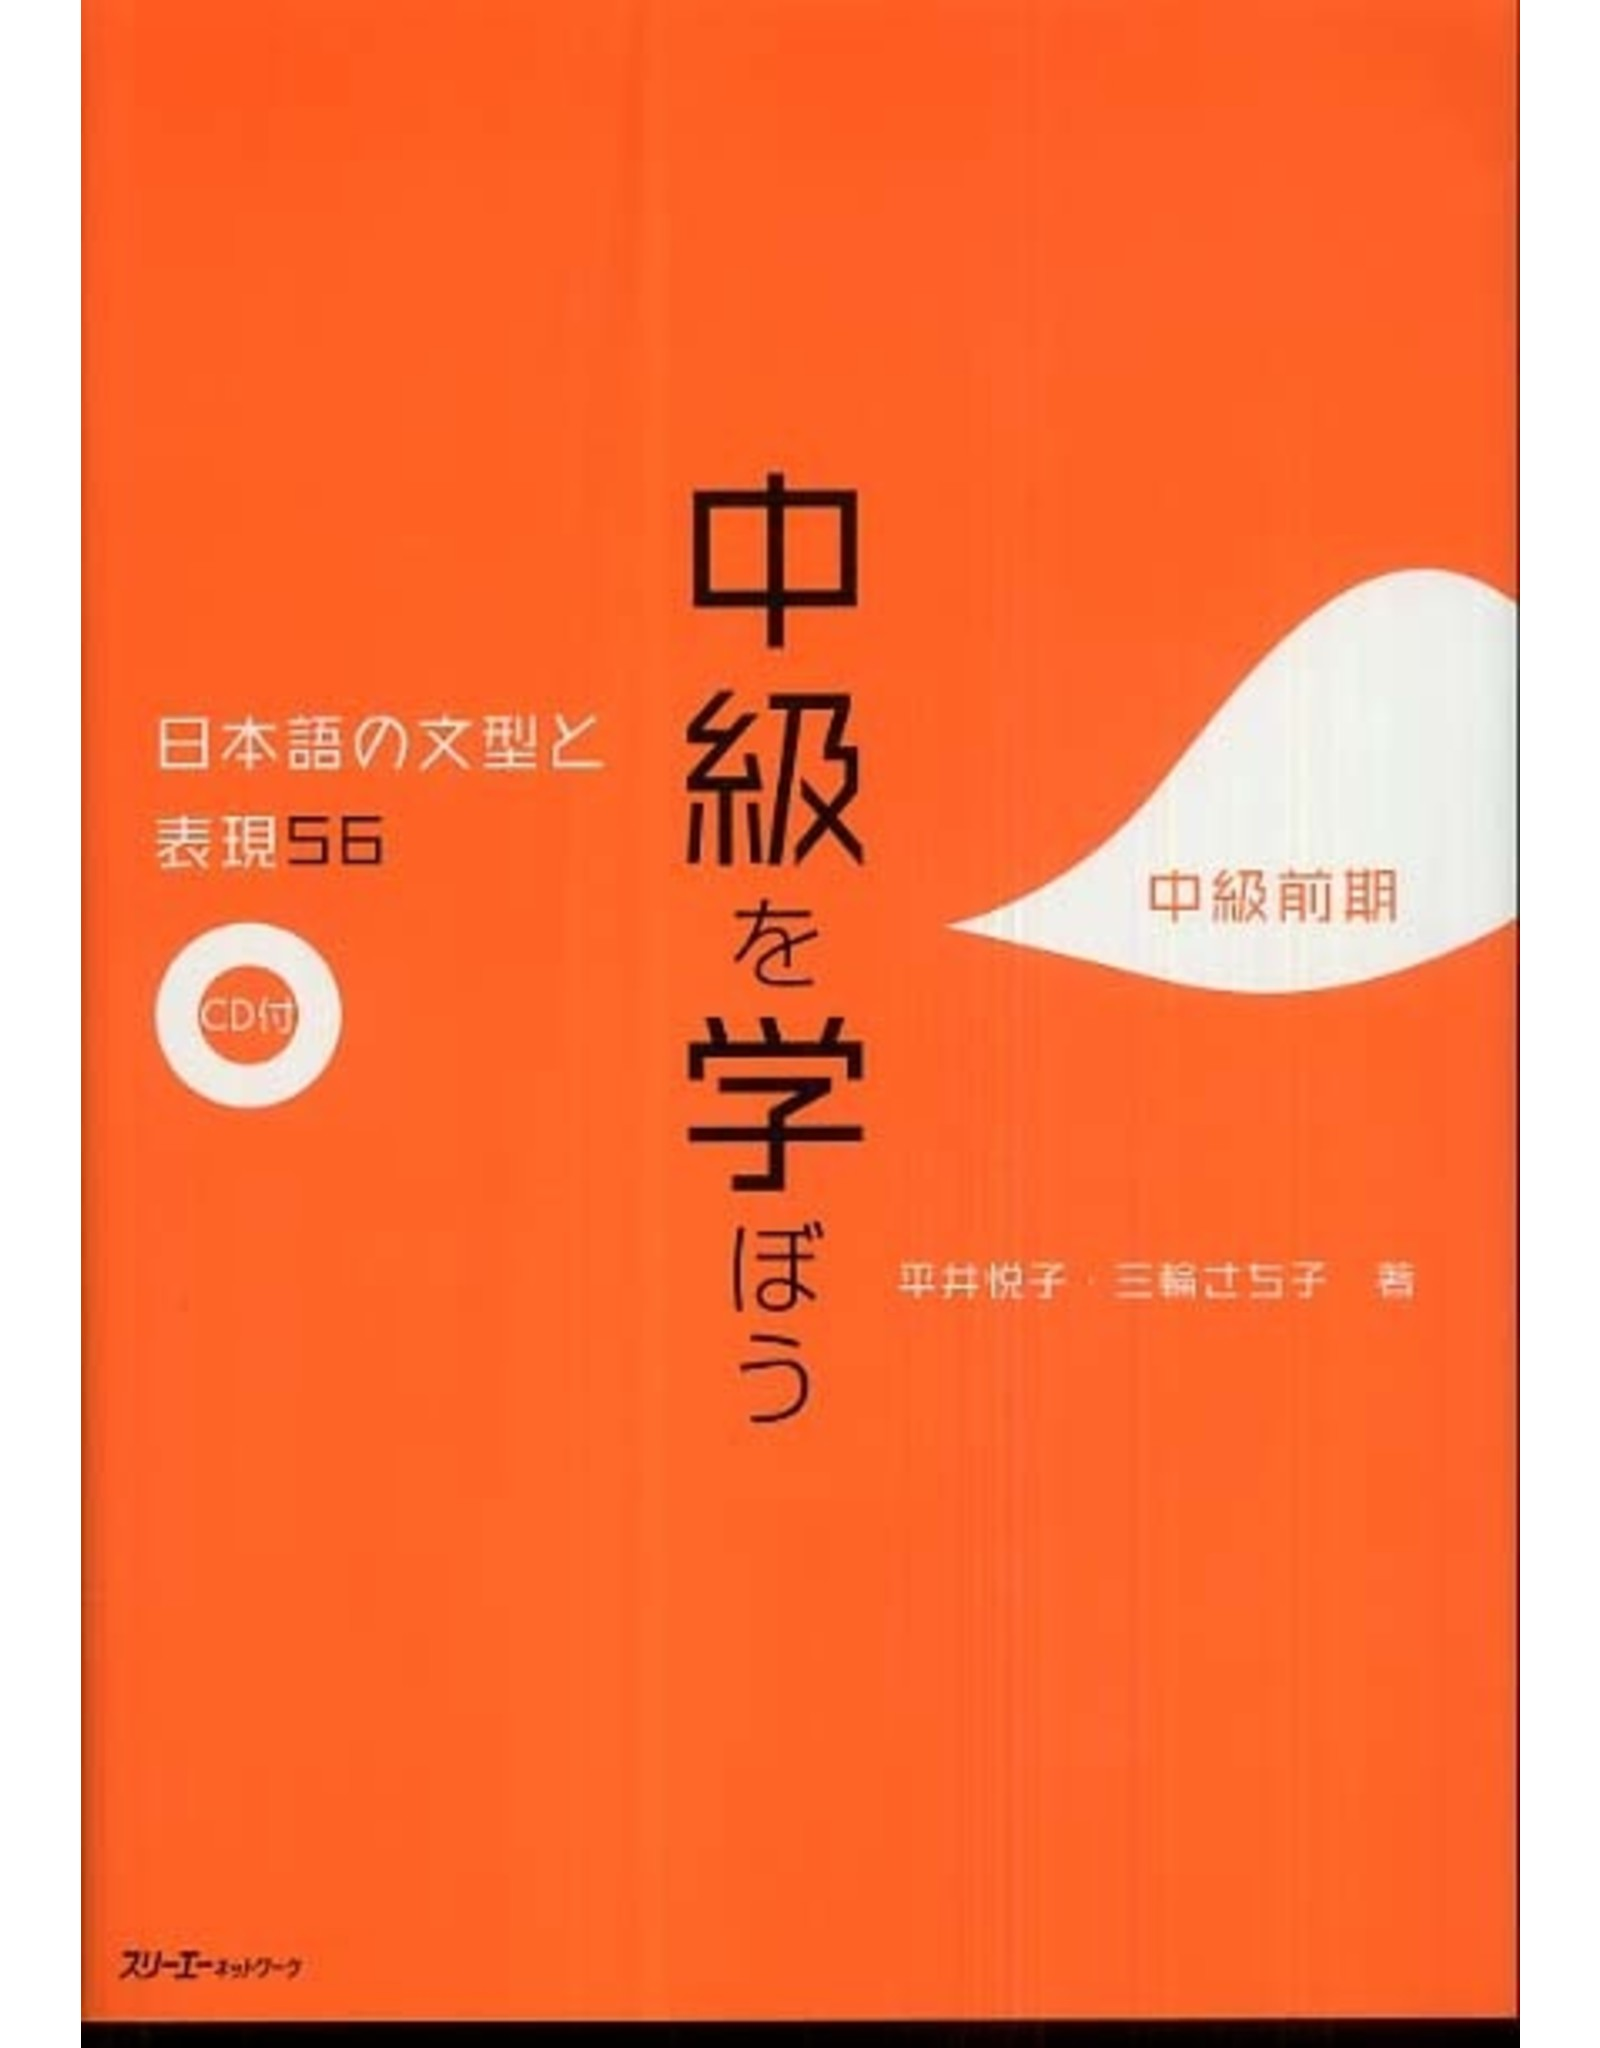 3A Corporation CHUKYU WO MANABOU - CHUKYU ZENKI